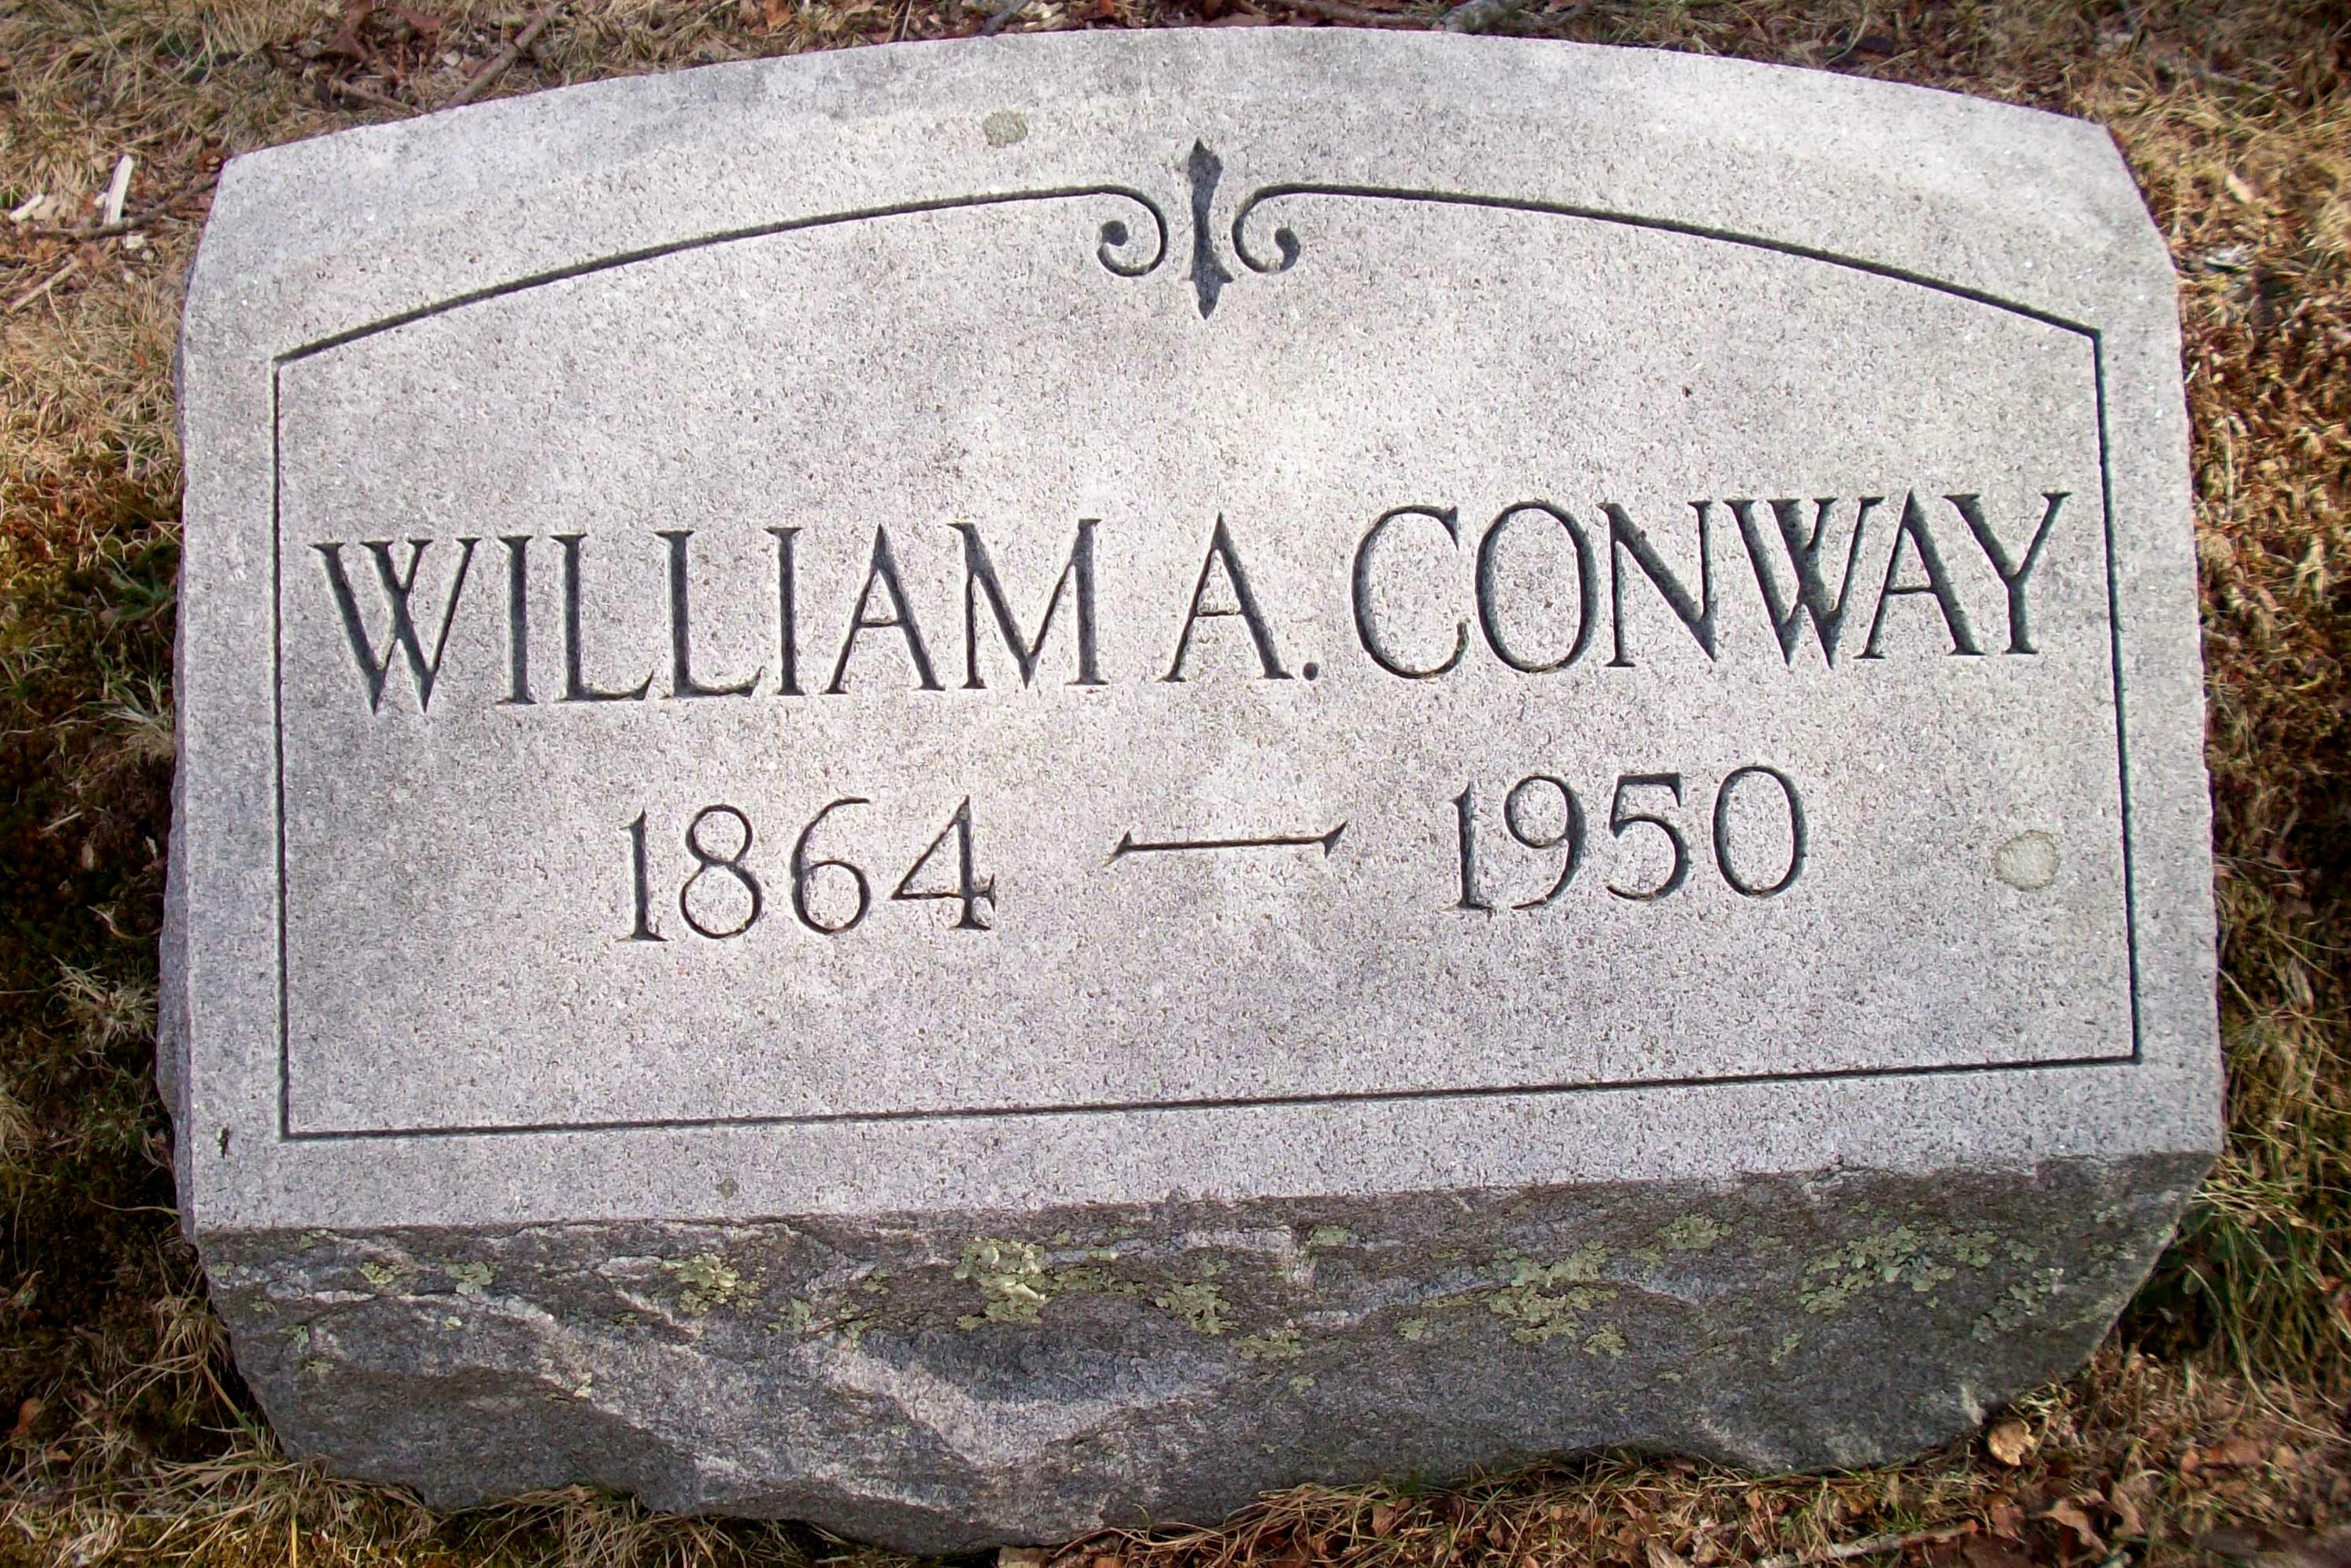 William E. Conway Jr.